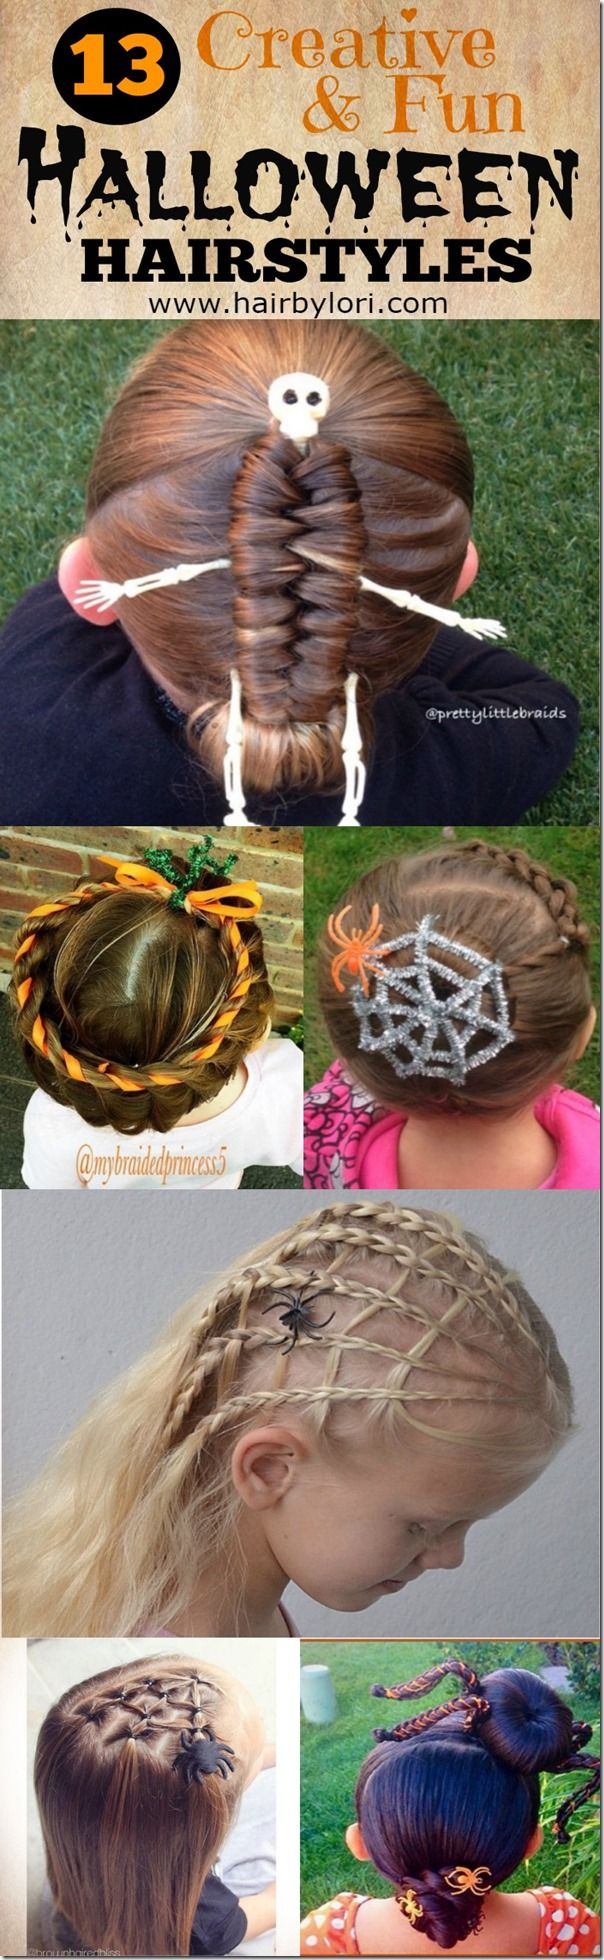 13 Creative Halloween Hairstyles